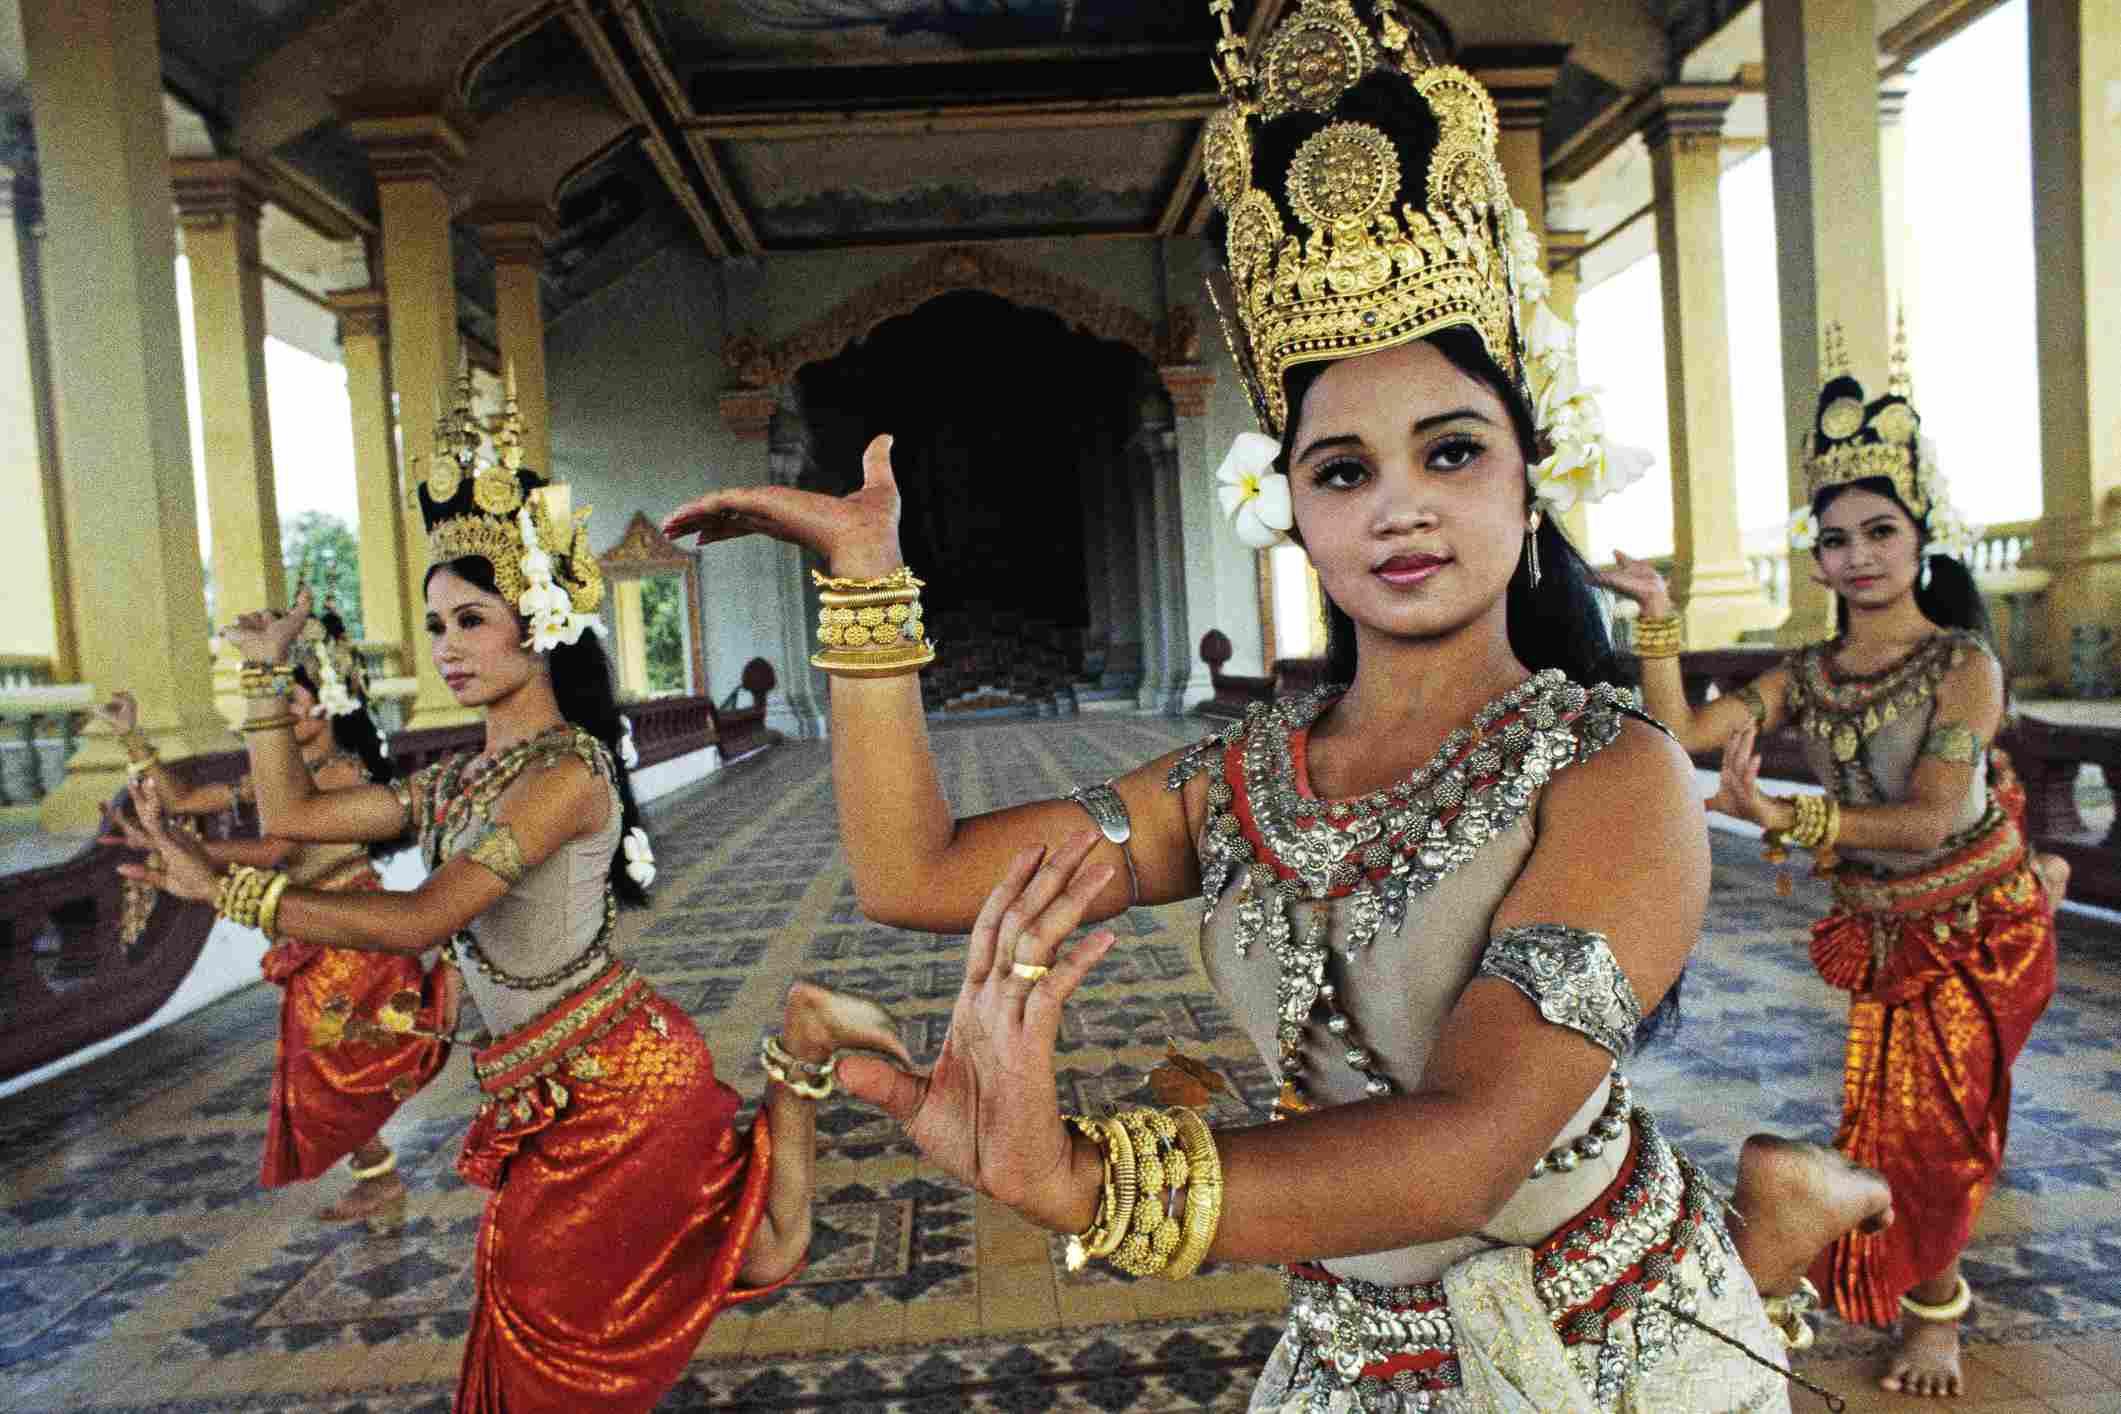 Apsara dancers at Royal Palace in Cambodia